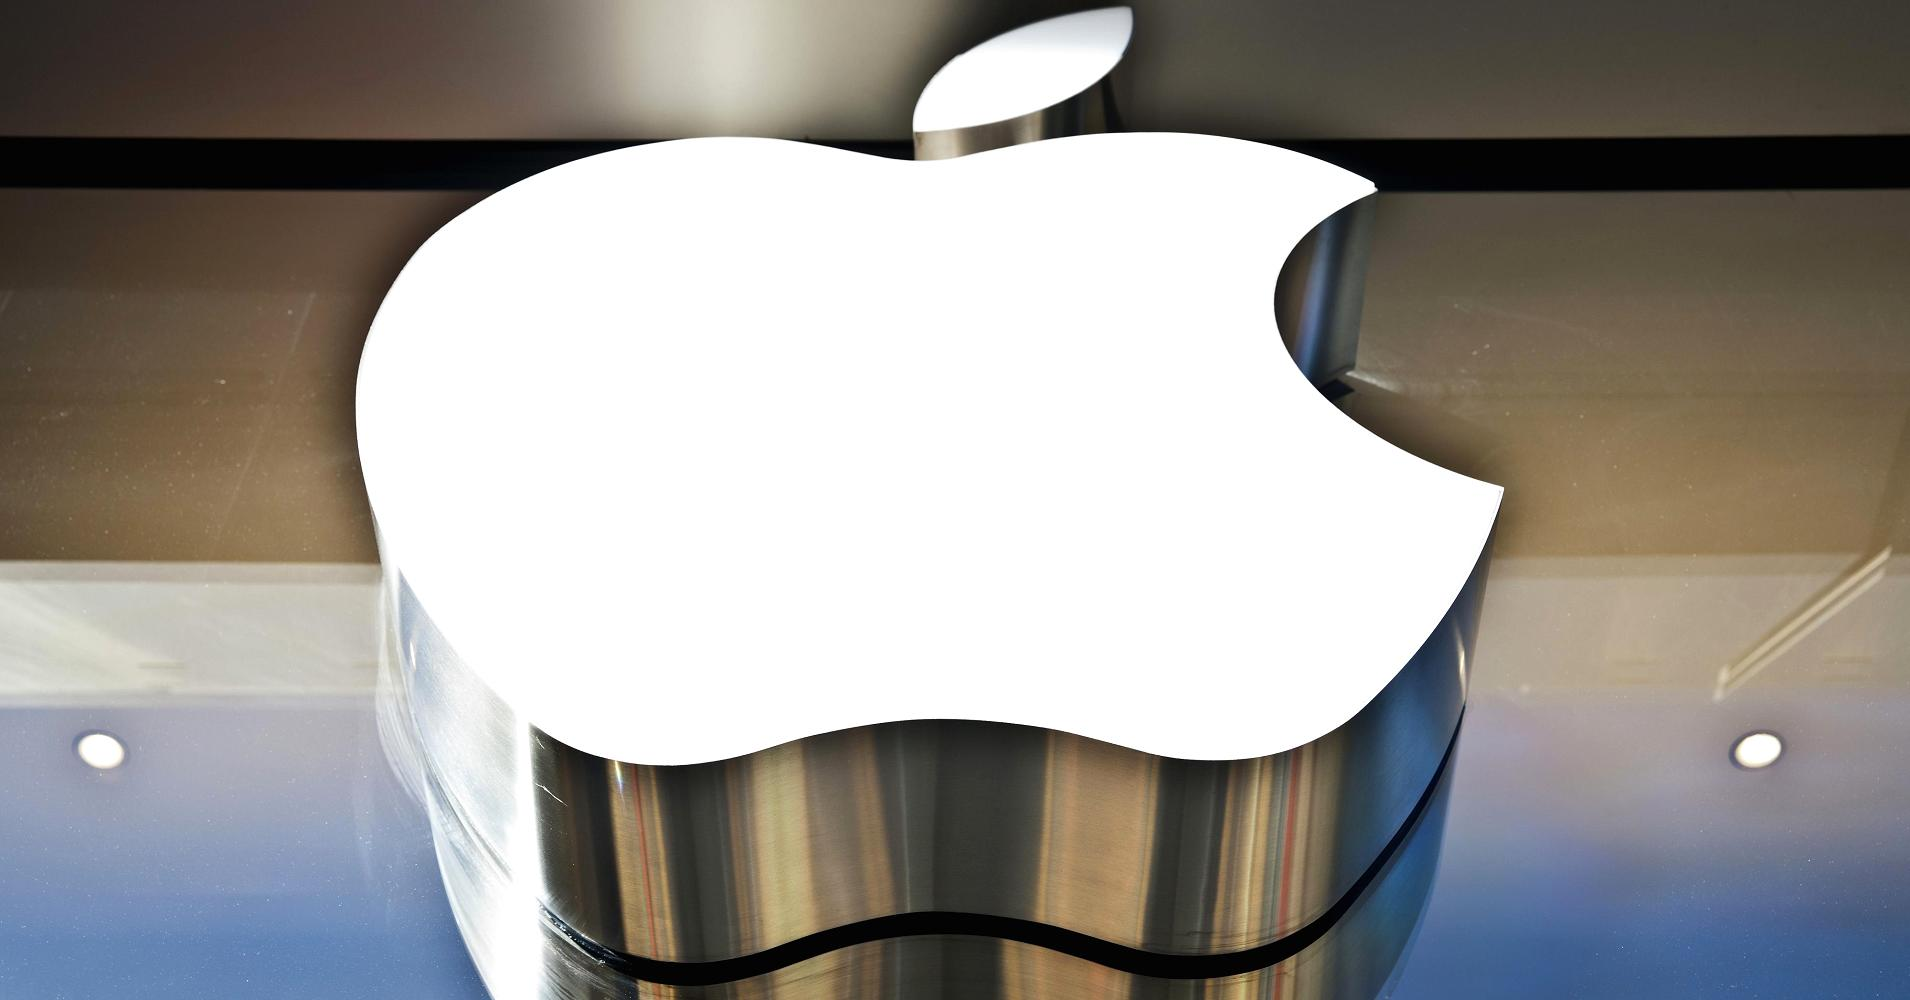 Apple Sued